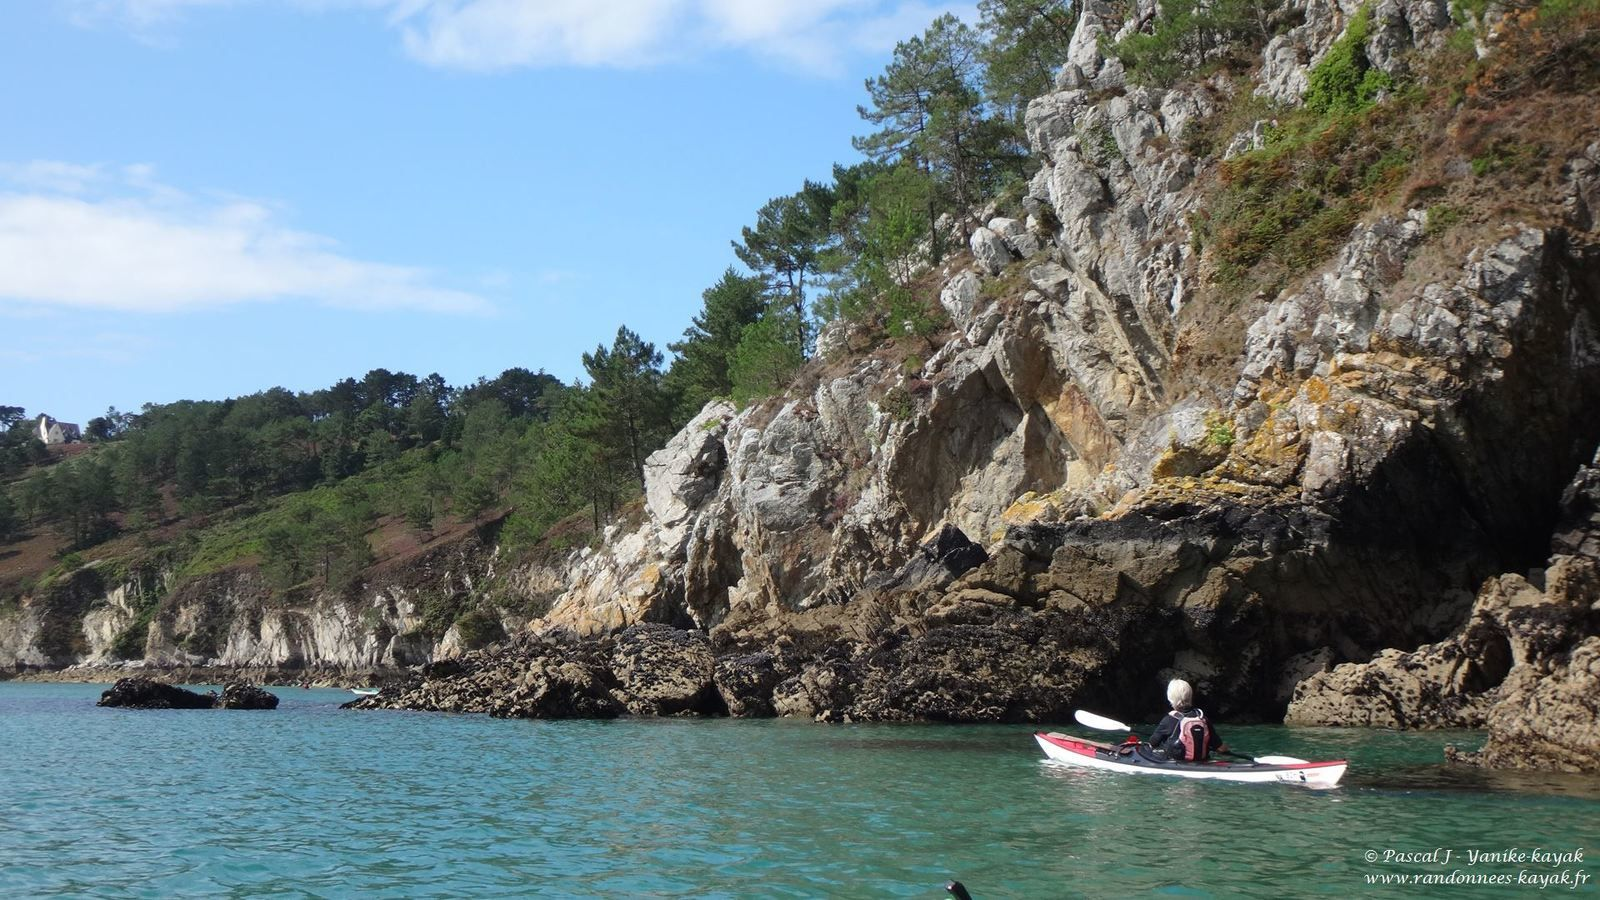 Presqu'île de Crozon : les grottes marines